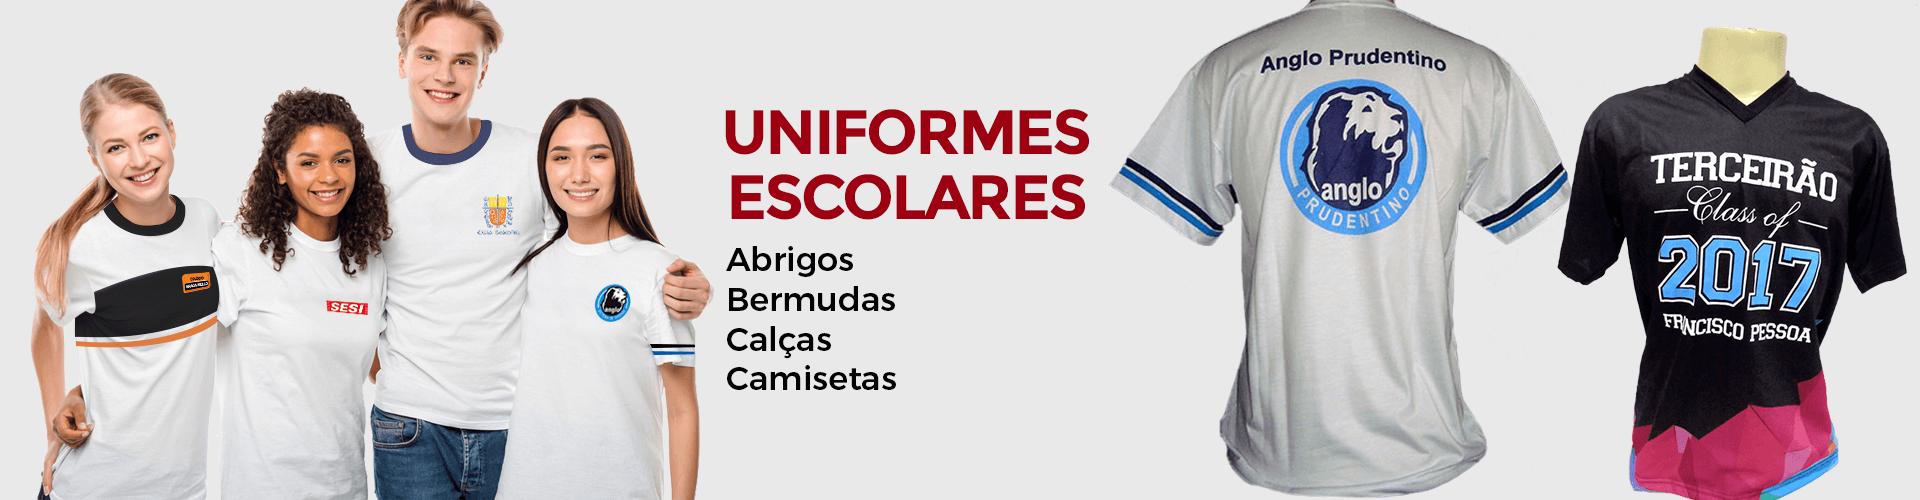 banner-vitrine-uniformes-escolares